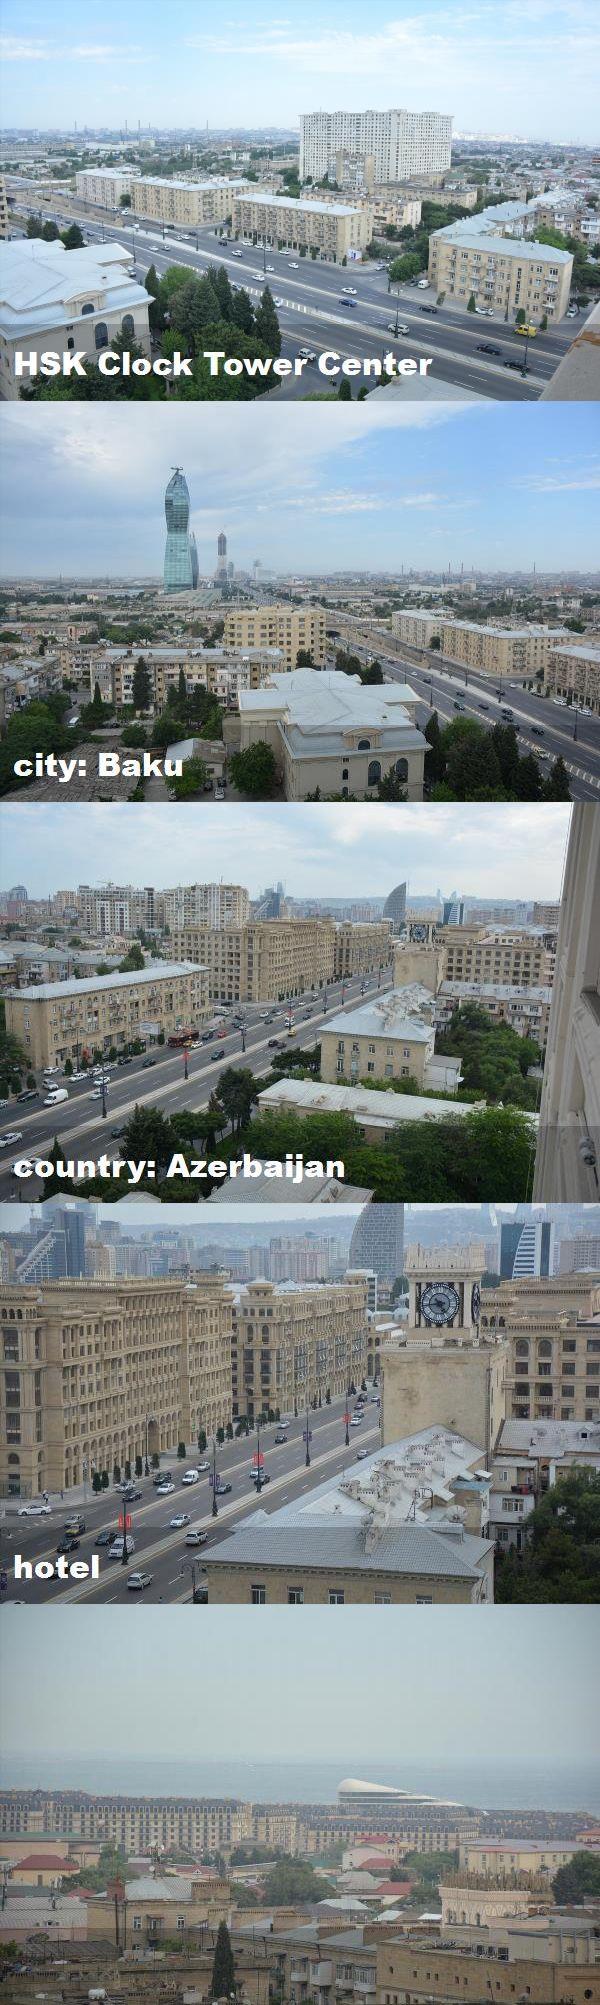 Hsk Clock Tower Center City Baku Country Azerbaijan Hotel City City Photo Tower